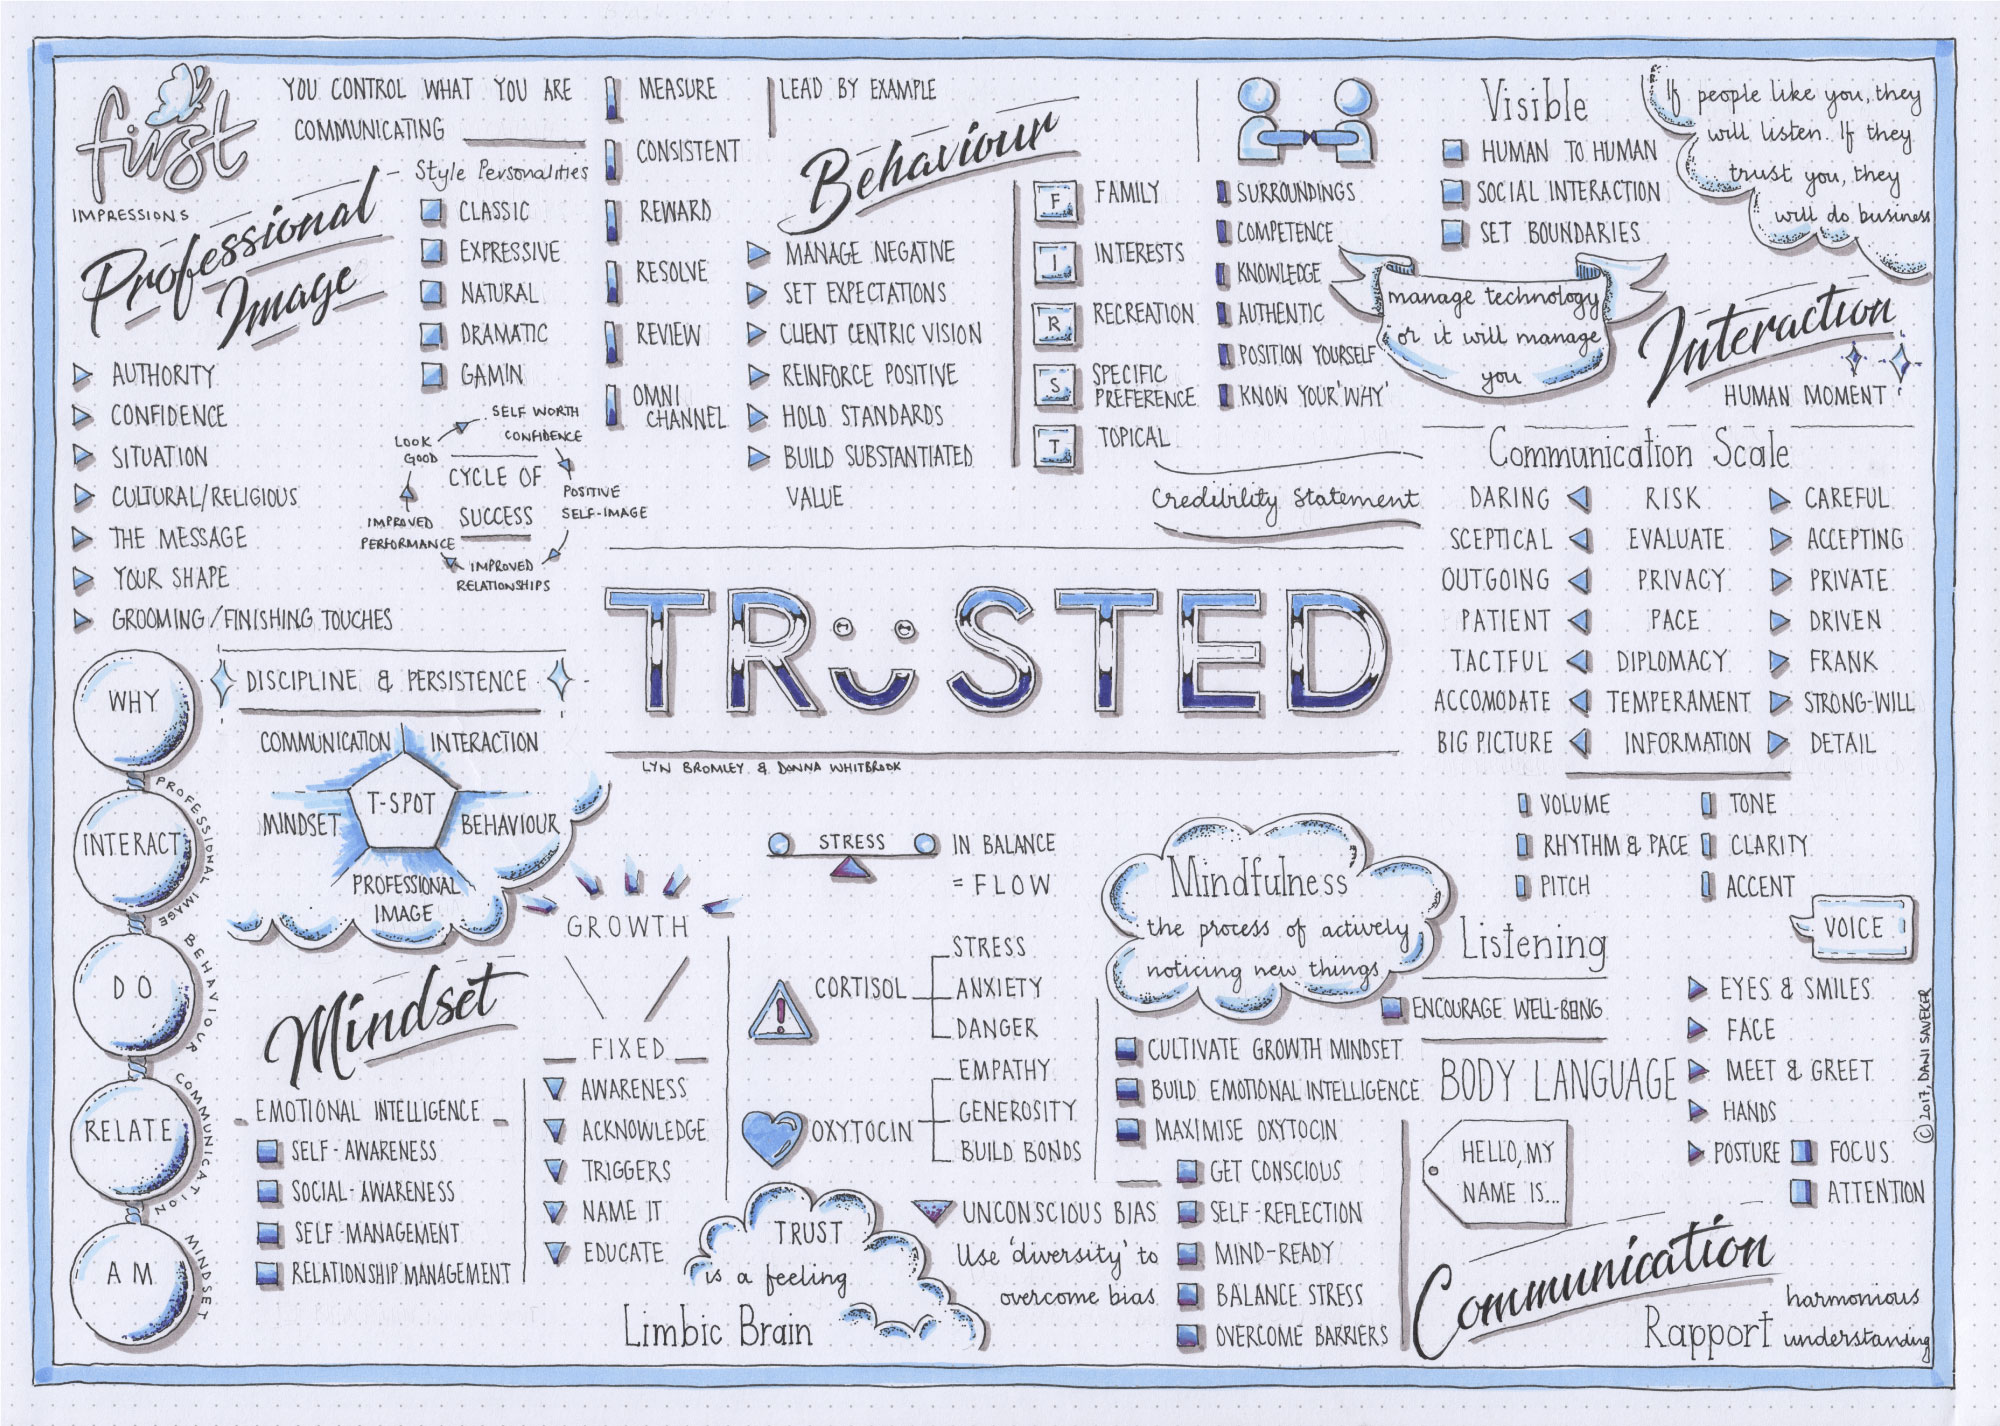 Trusted-(1).jpg